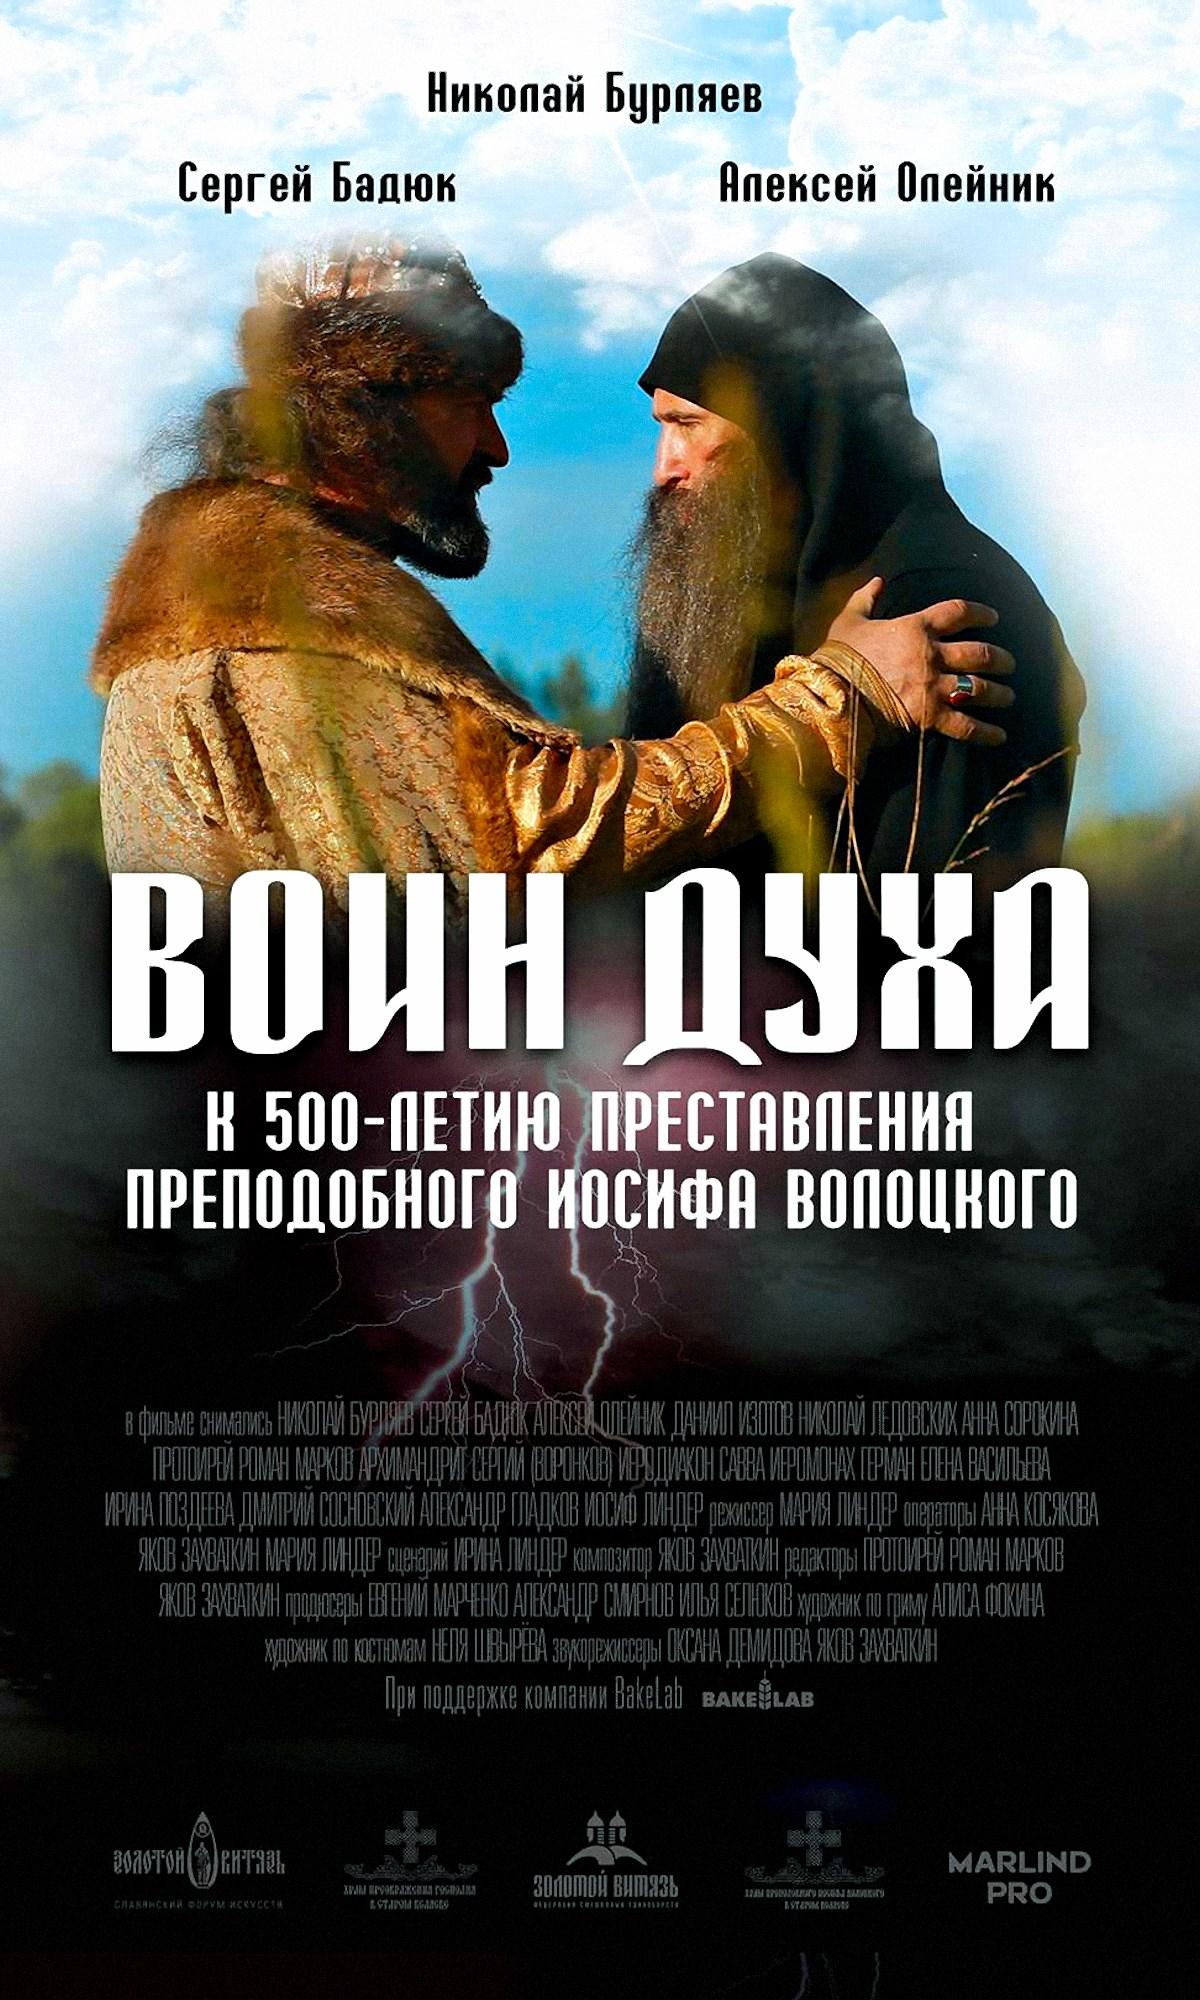 00 spirtual warrior. russia. st iosif volotsky. 190516